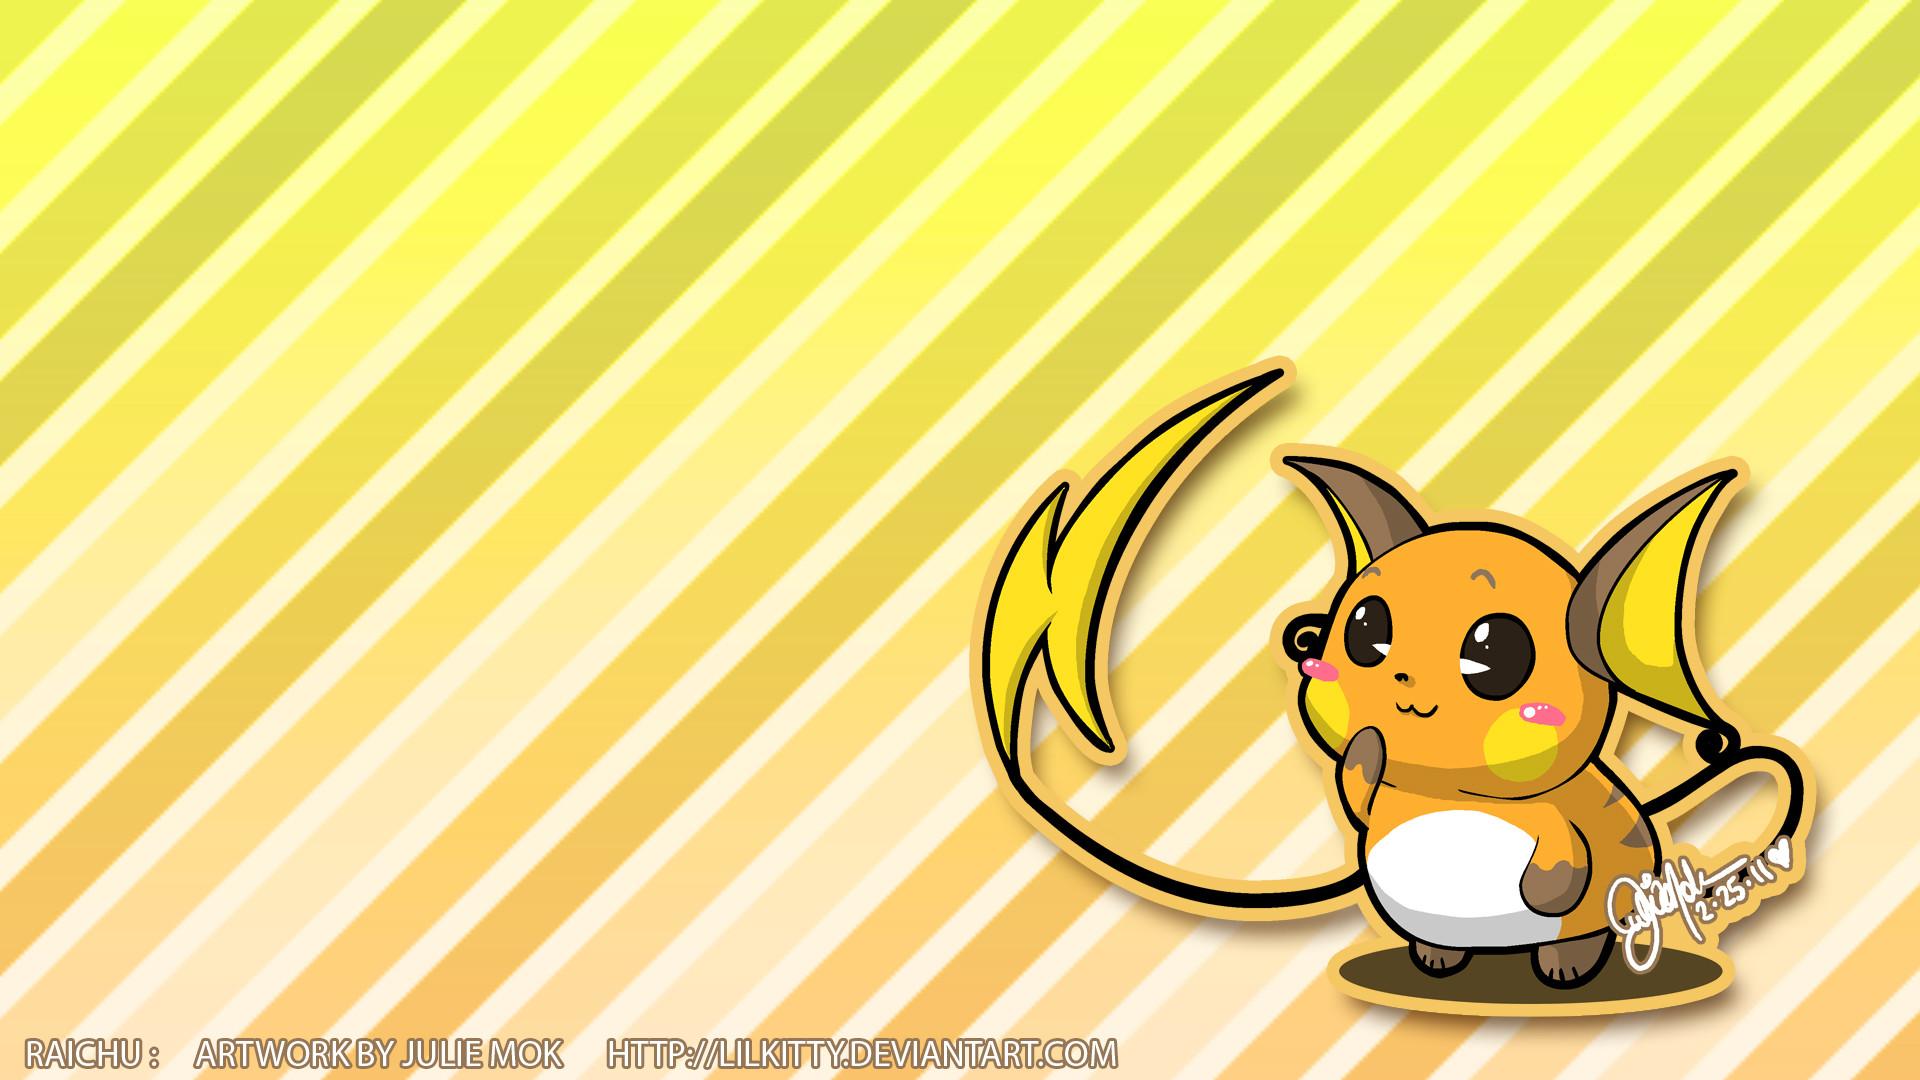 Cute Raichu Wallpaper Pichu Wallpaper 59 Images